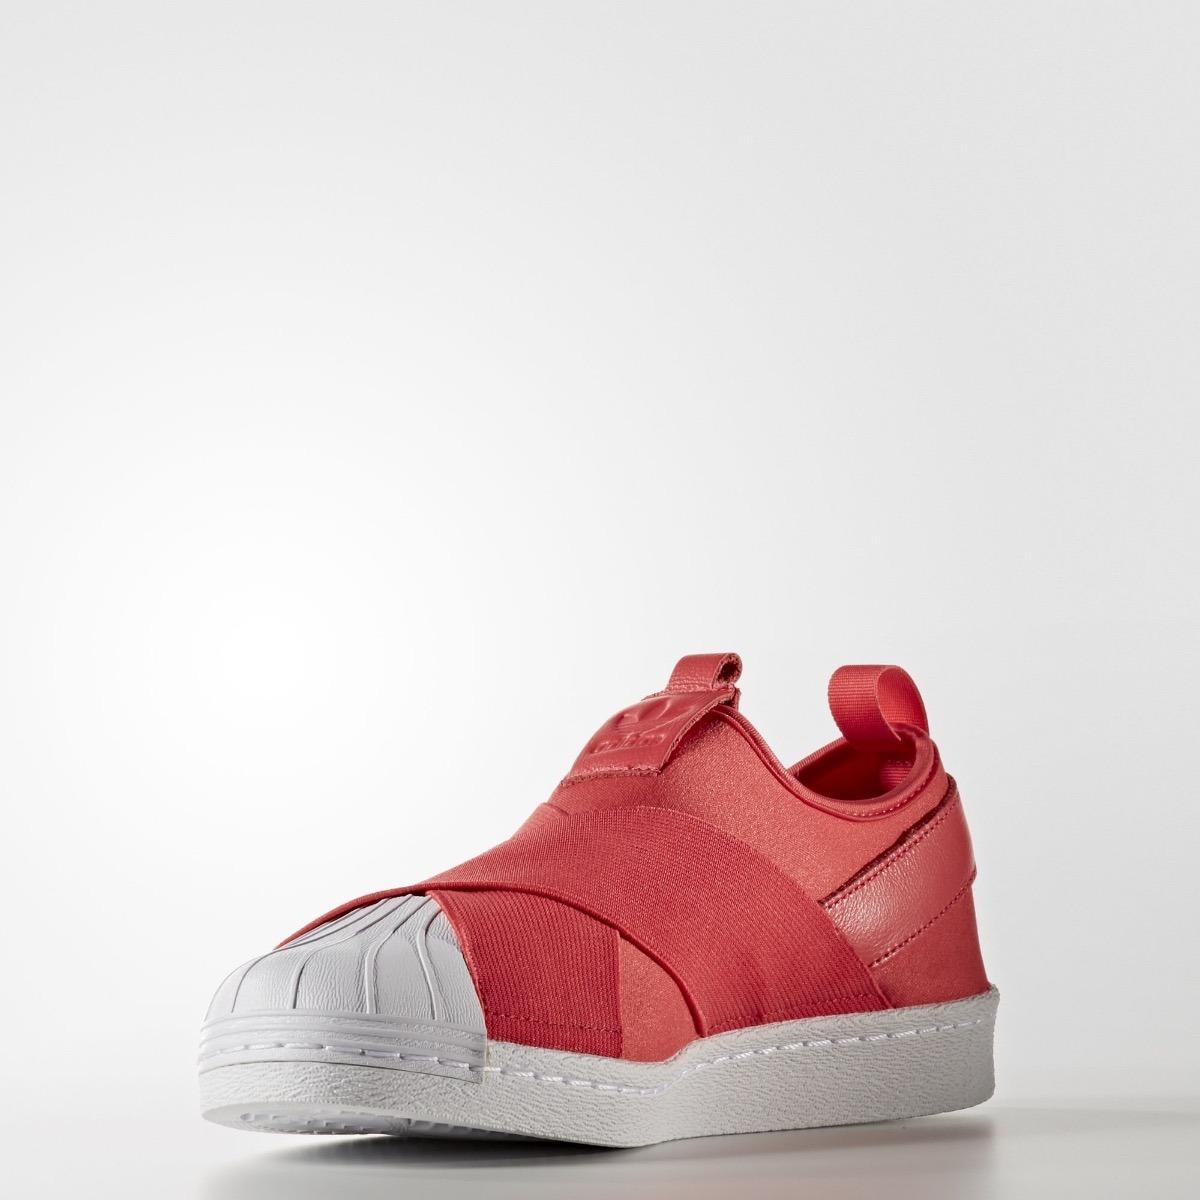 431a6b0f1a41b zapatillas adidas superstar slip on rojas. Cargando zoom.